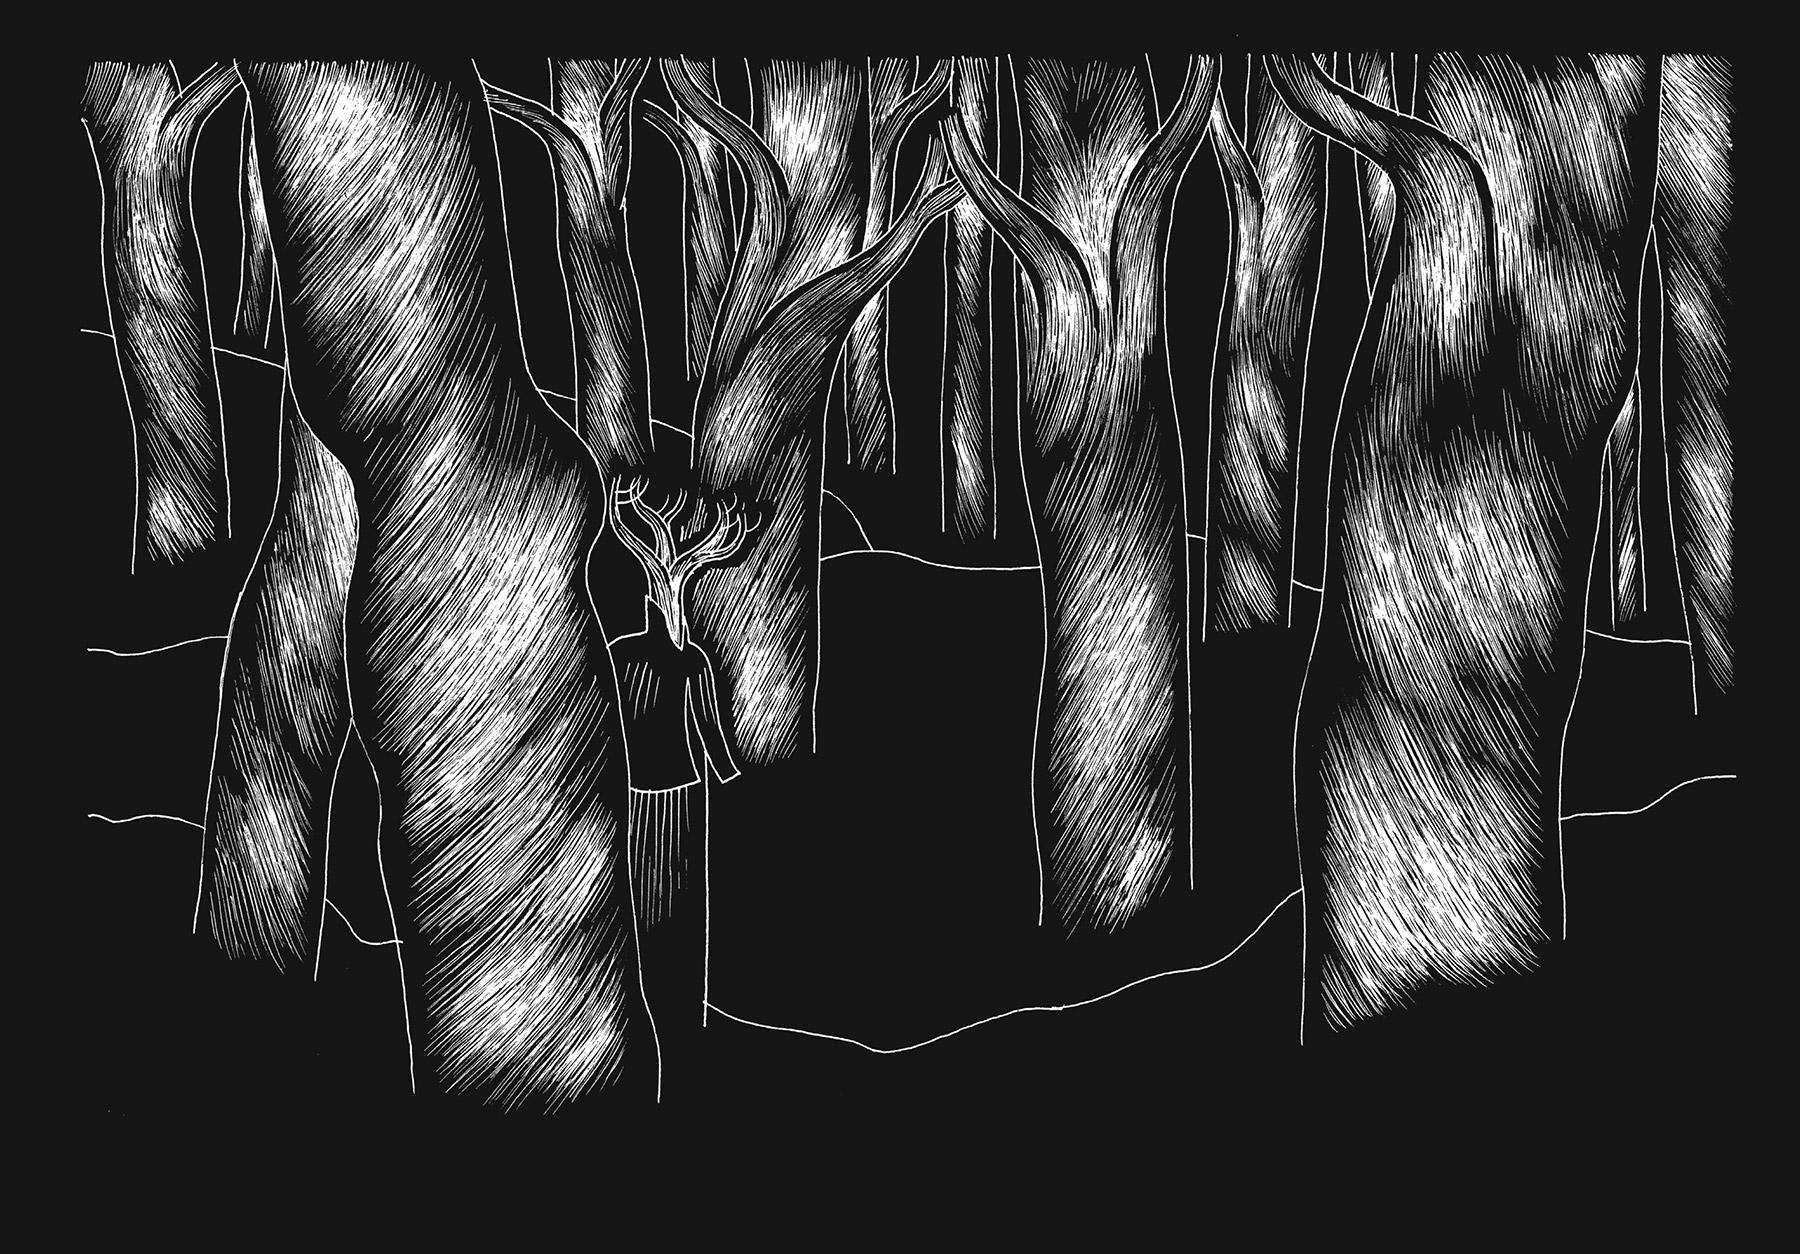 davidm-arboreal-web_expanded-2.jpg